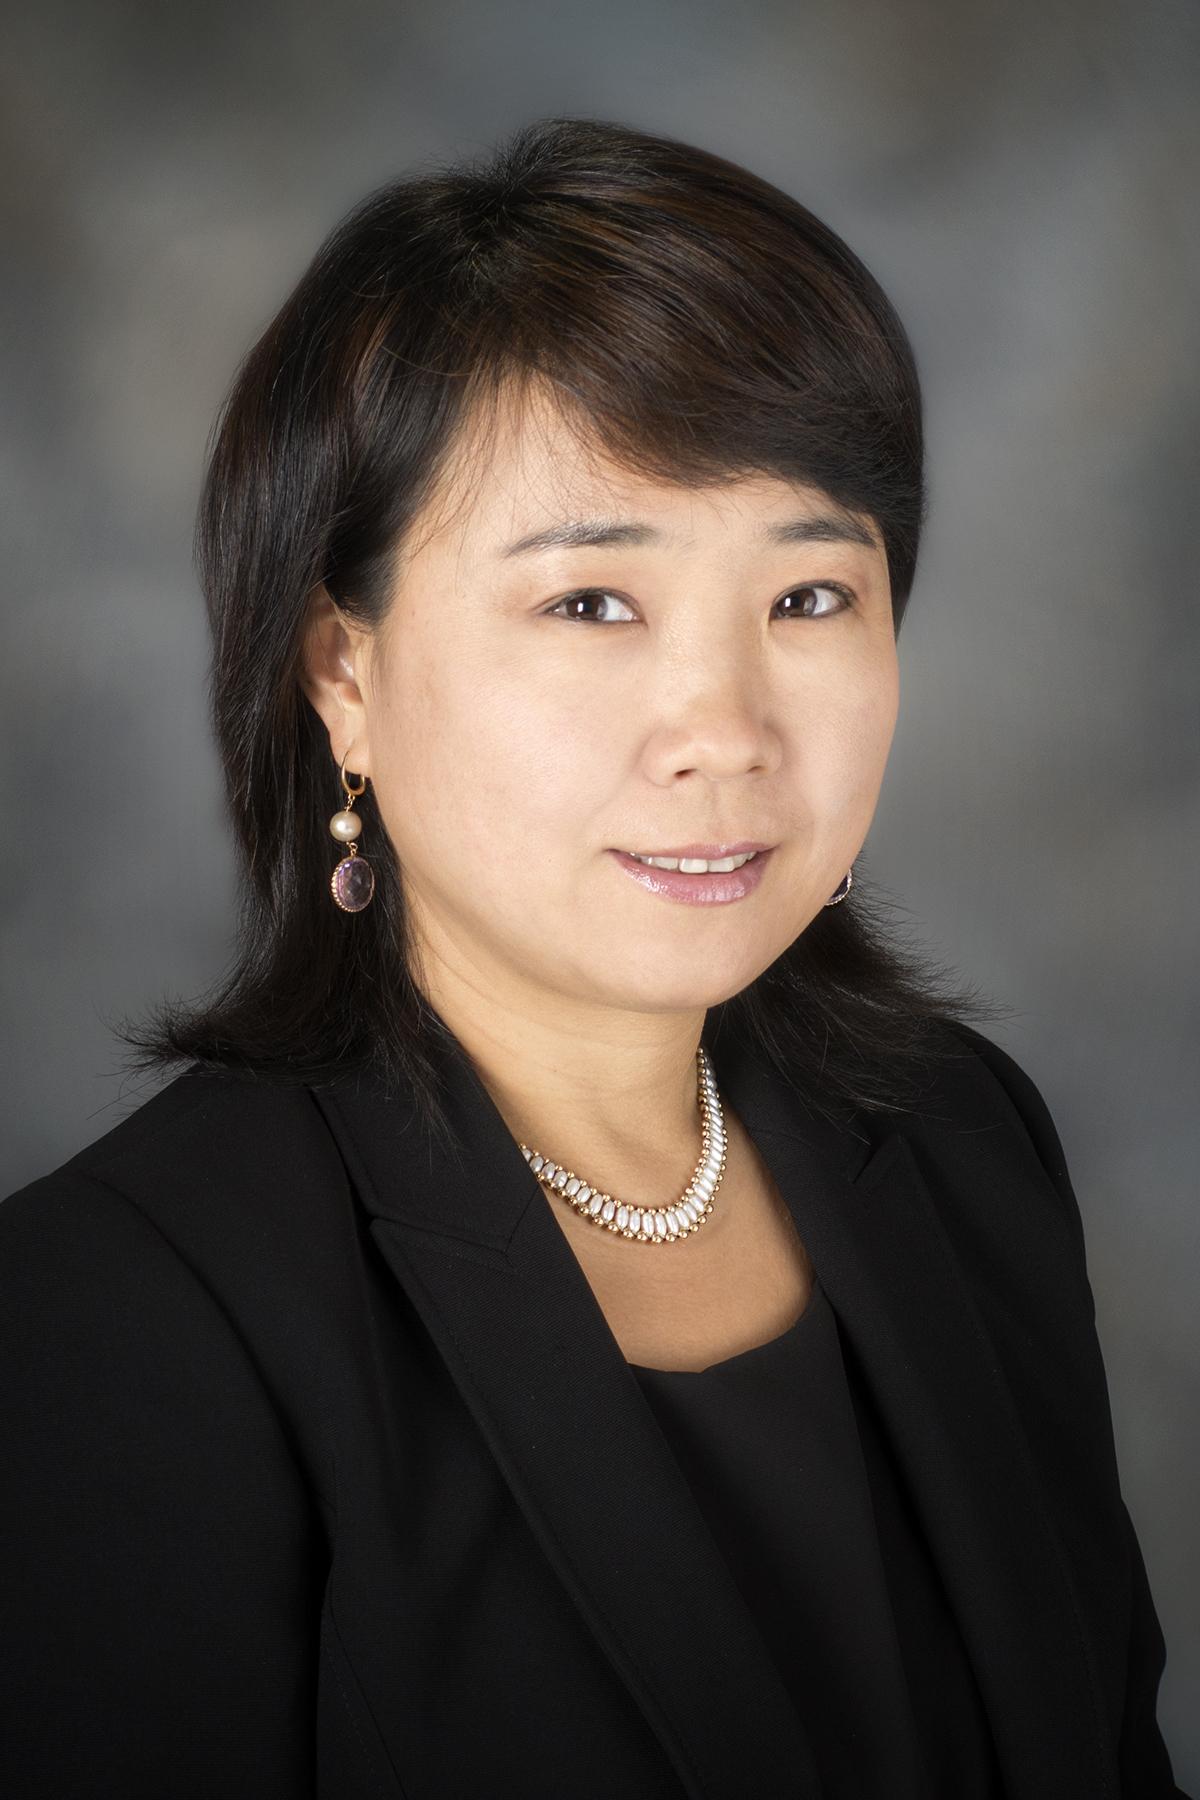 Yinghong Wang, M.D., Ph.D.